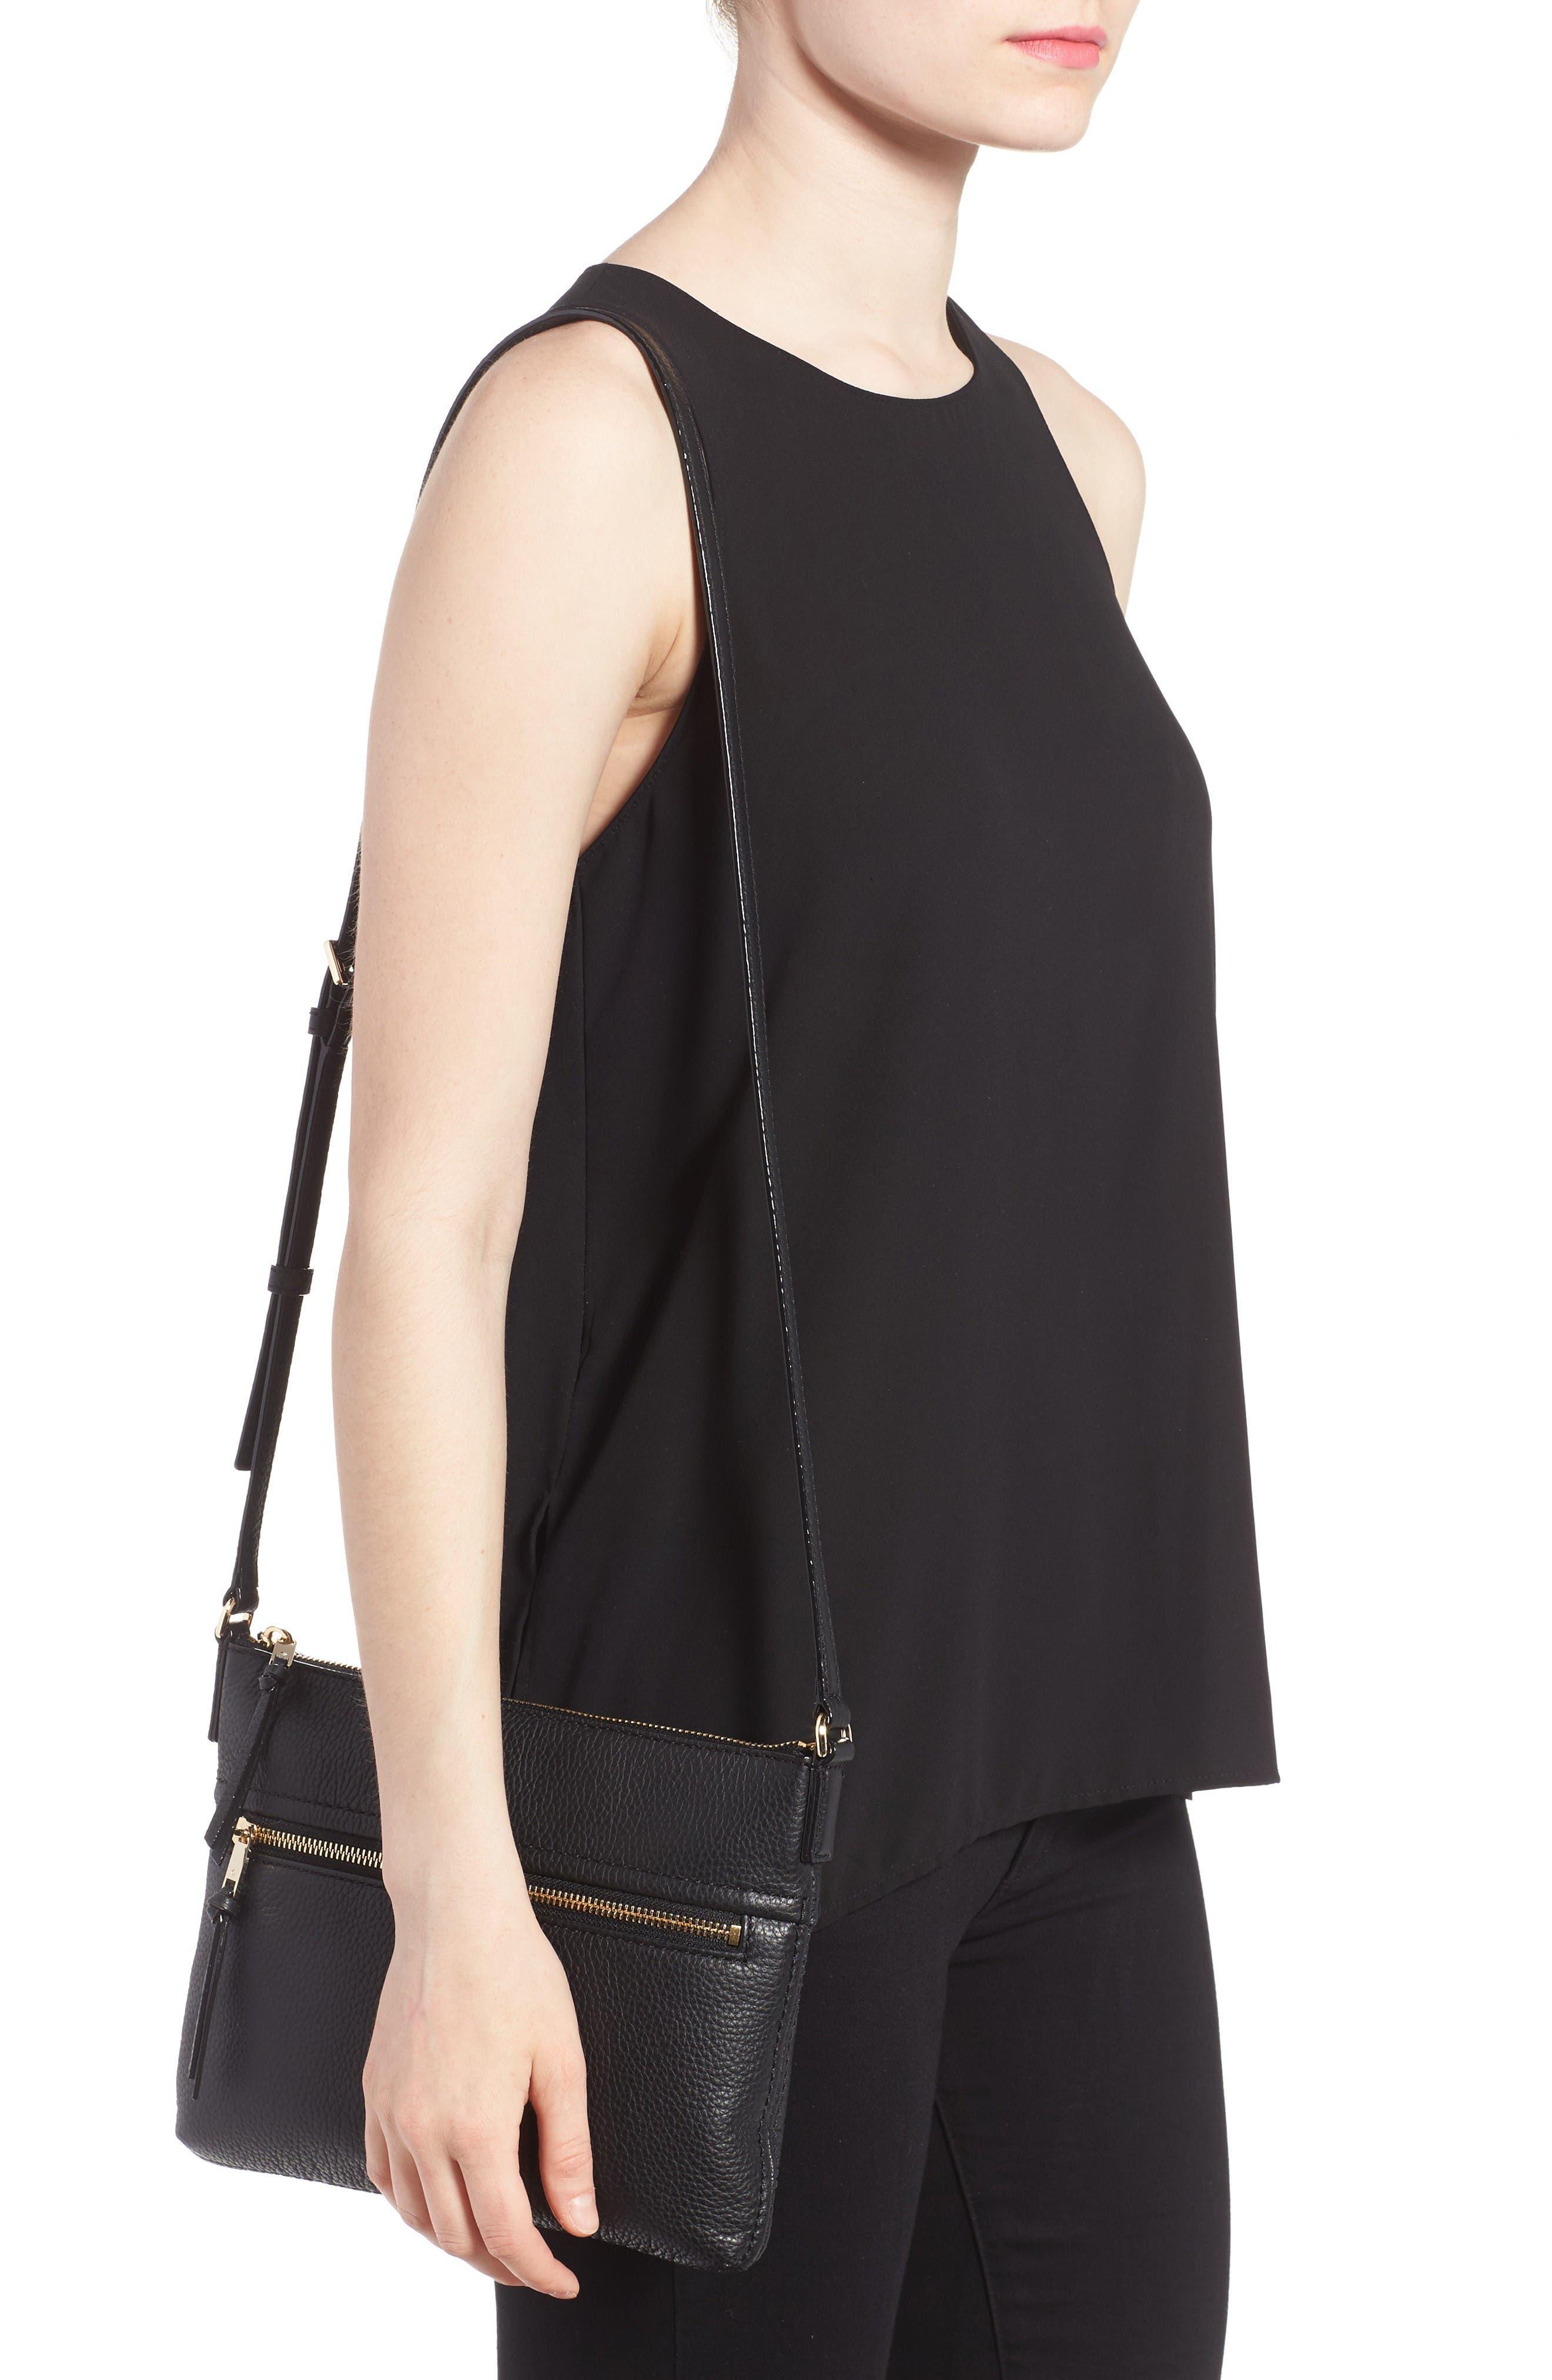 Kate Spade New York Handbags Purses Nordstrom Katespade Adrien Large Two Tone Authentic